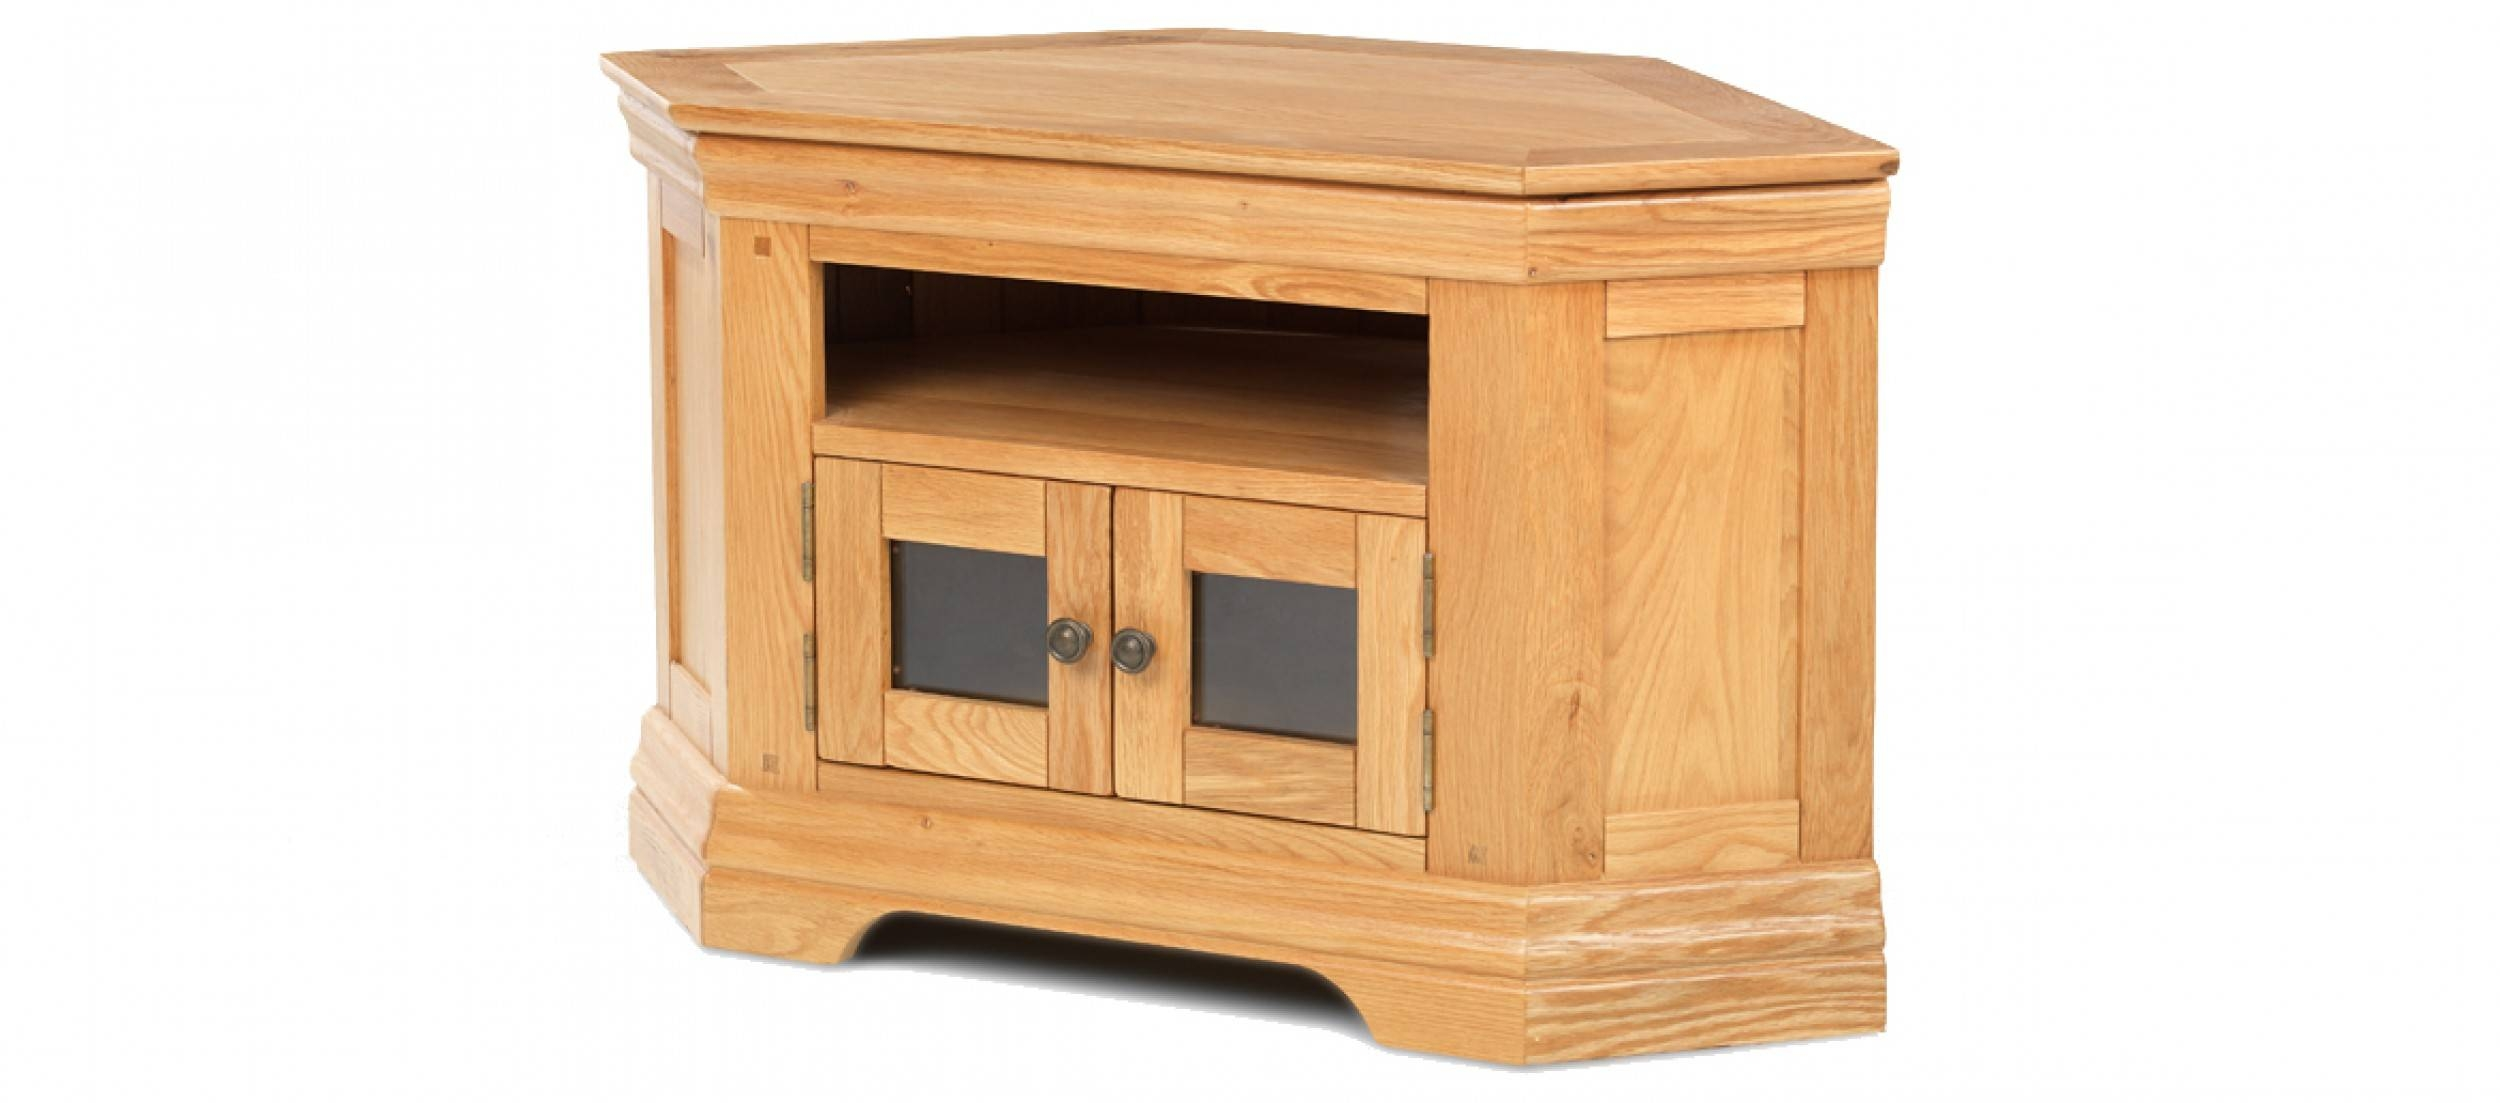 Constance Oak Corner Tv Cabinet | Quercus Living with Oak Corner Tv Stands (Image 2 of 15)